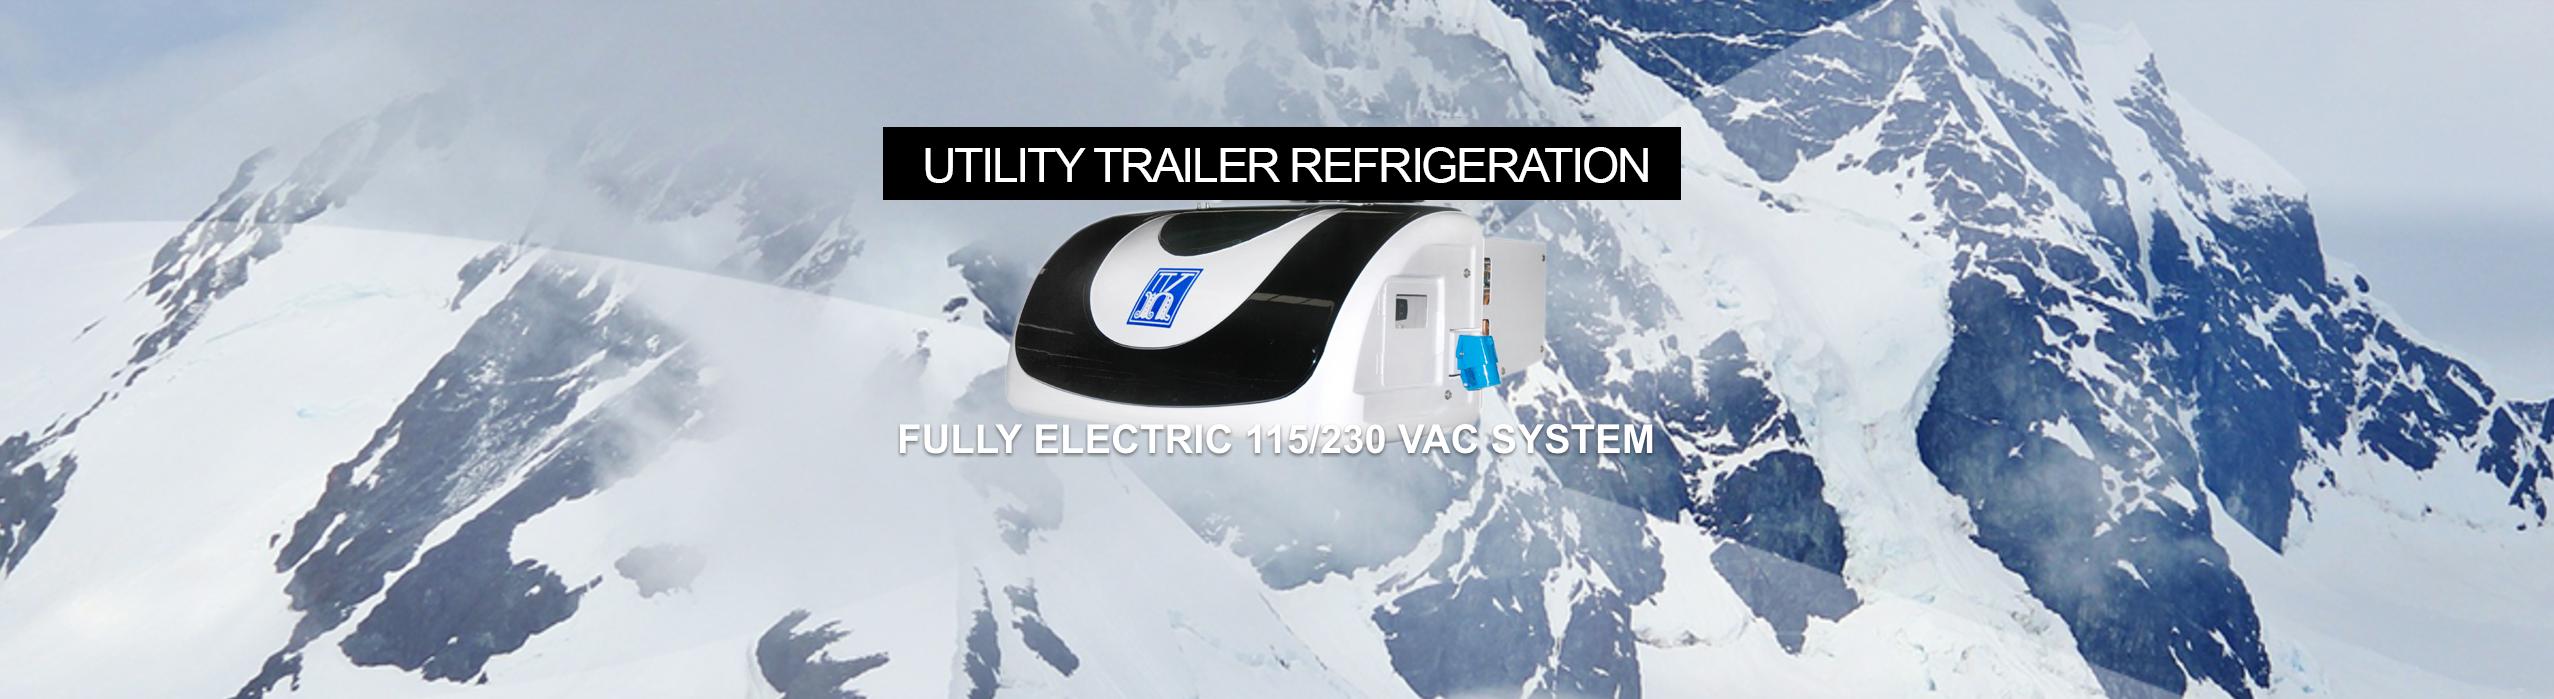 Kingtec Utility Trailer Electric System - Produce Transport Refrigeration